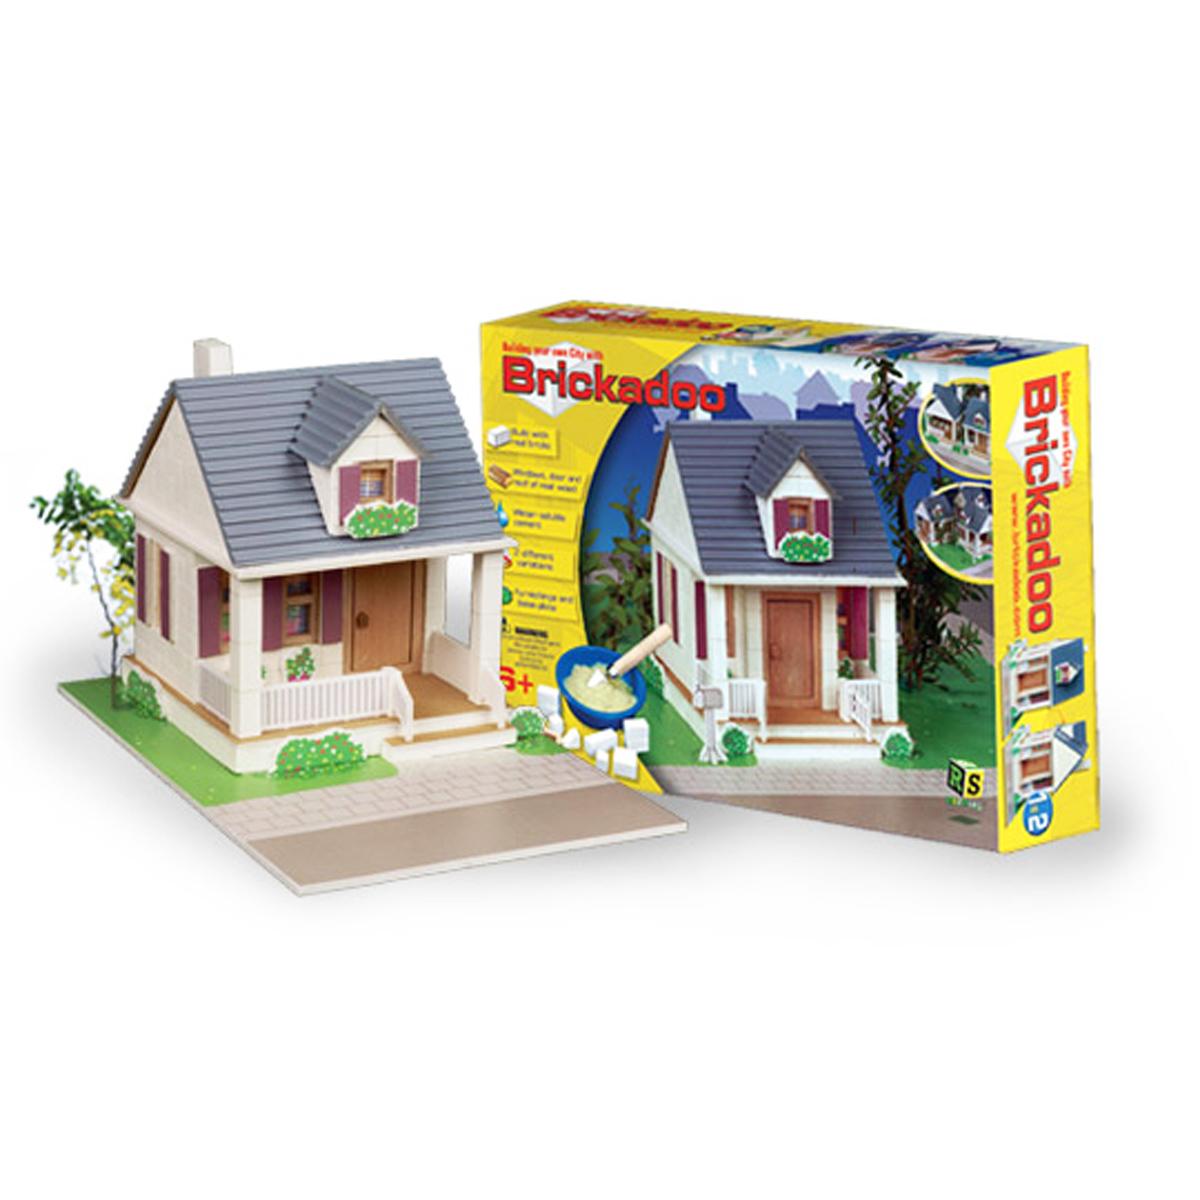 Construction Toy Brickadoo House Building Blocks Rs2play